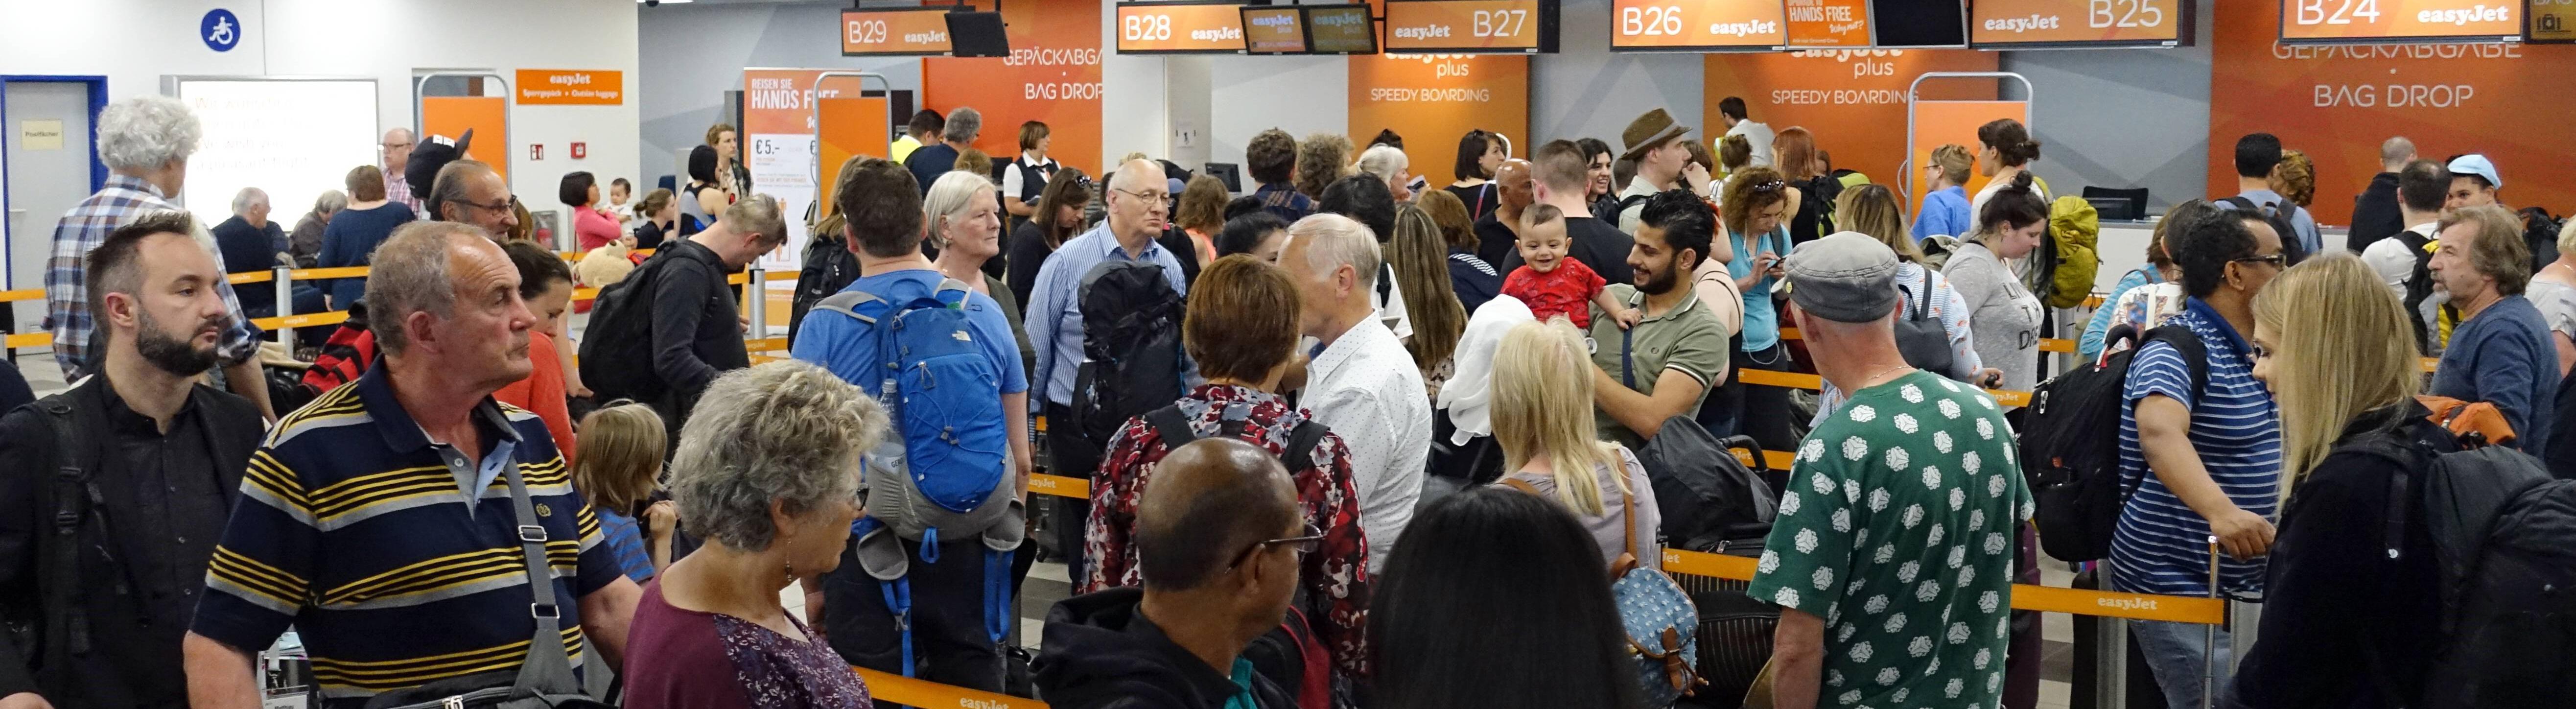 Flugpassagiere stehen am Check-in von easyJet am Flughafen Berlin-Schoenefeld an. (abfertigen, Abfertigung,